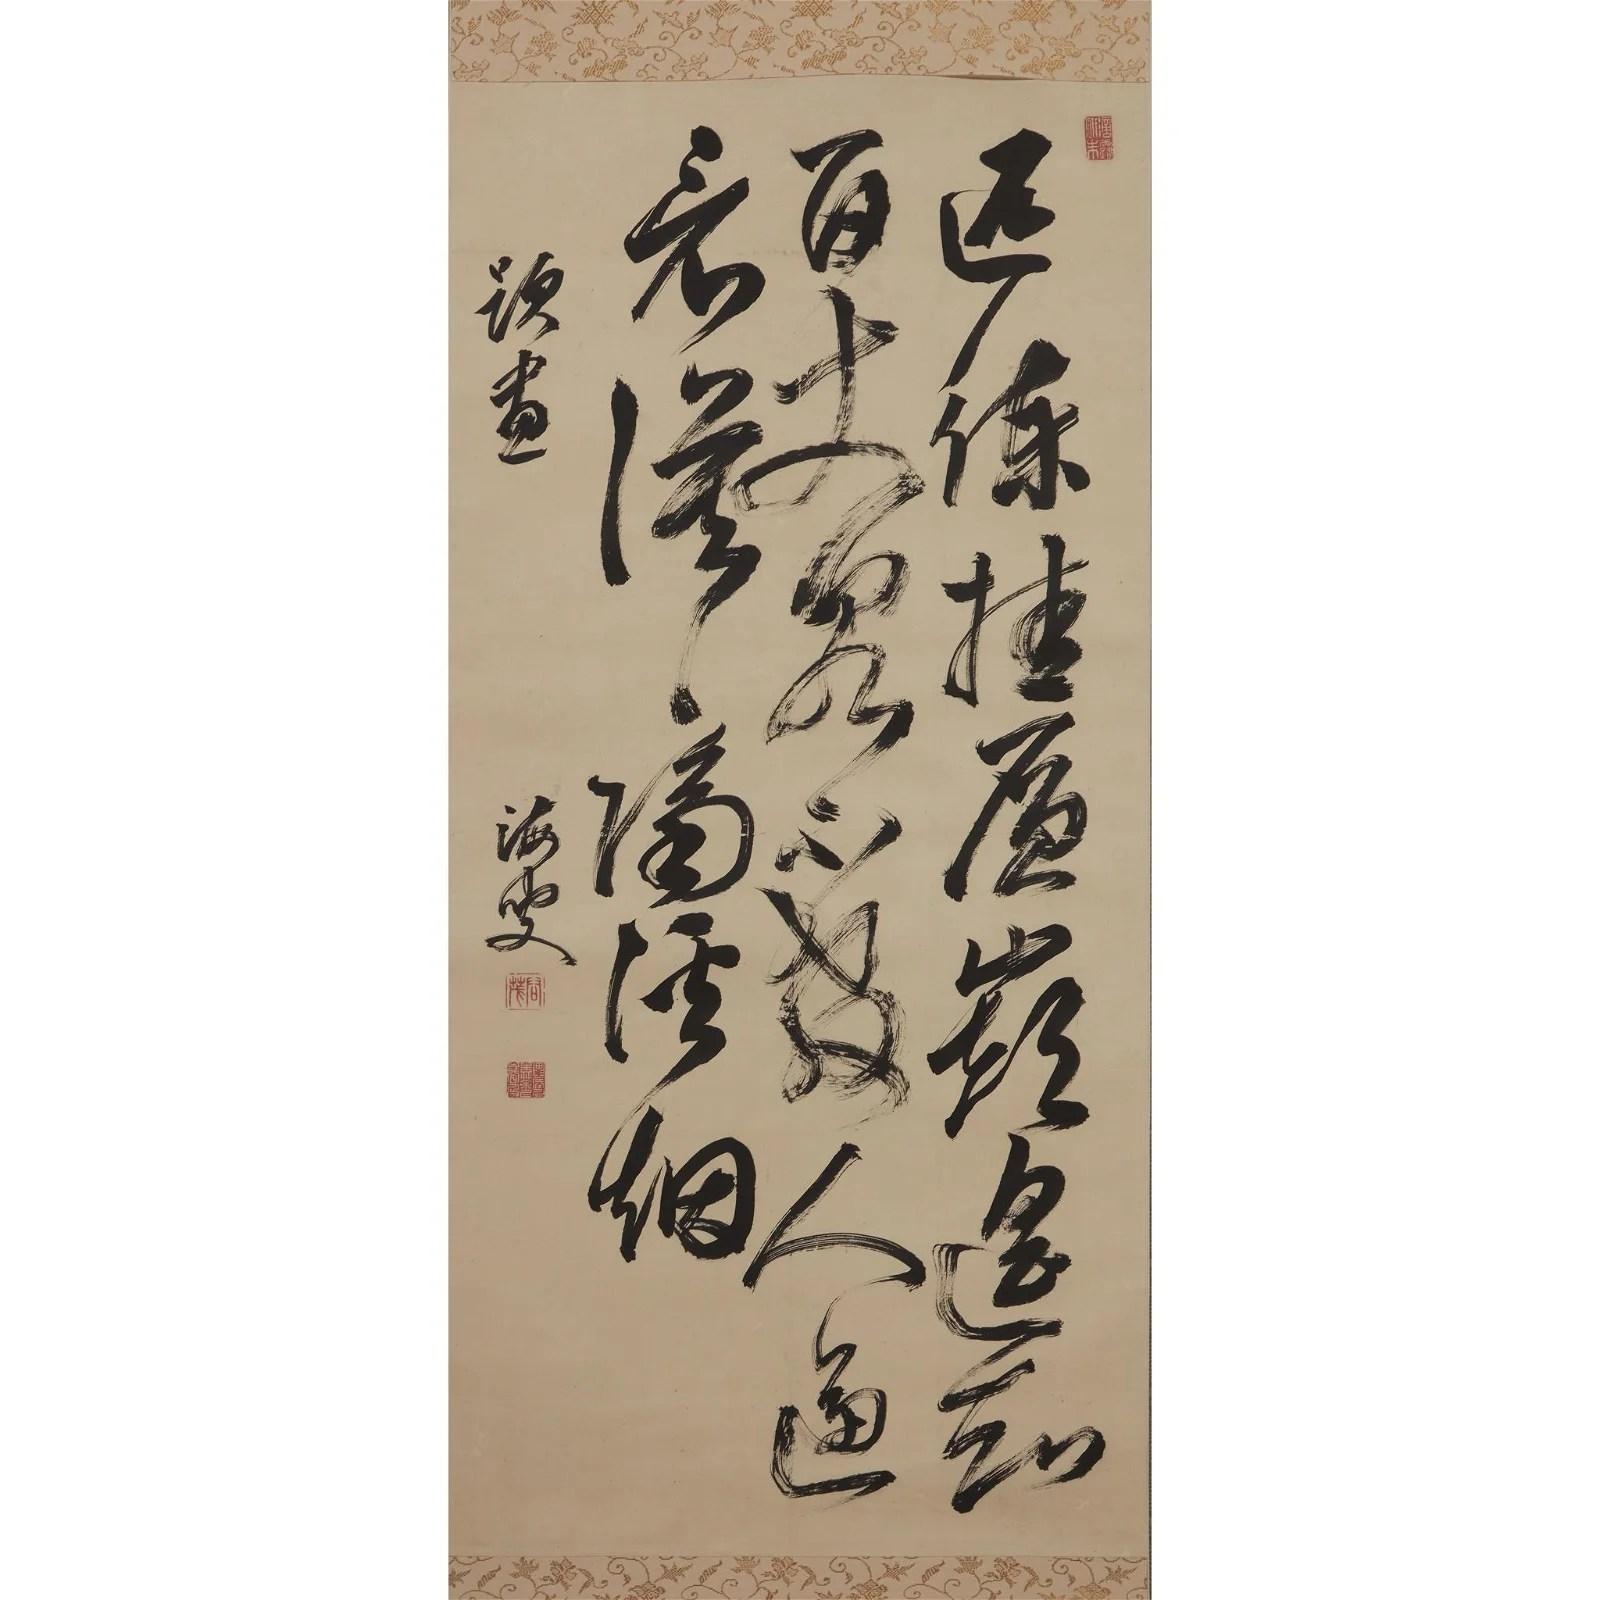 NUKINO KAIOKU (1778-1863),